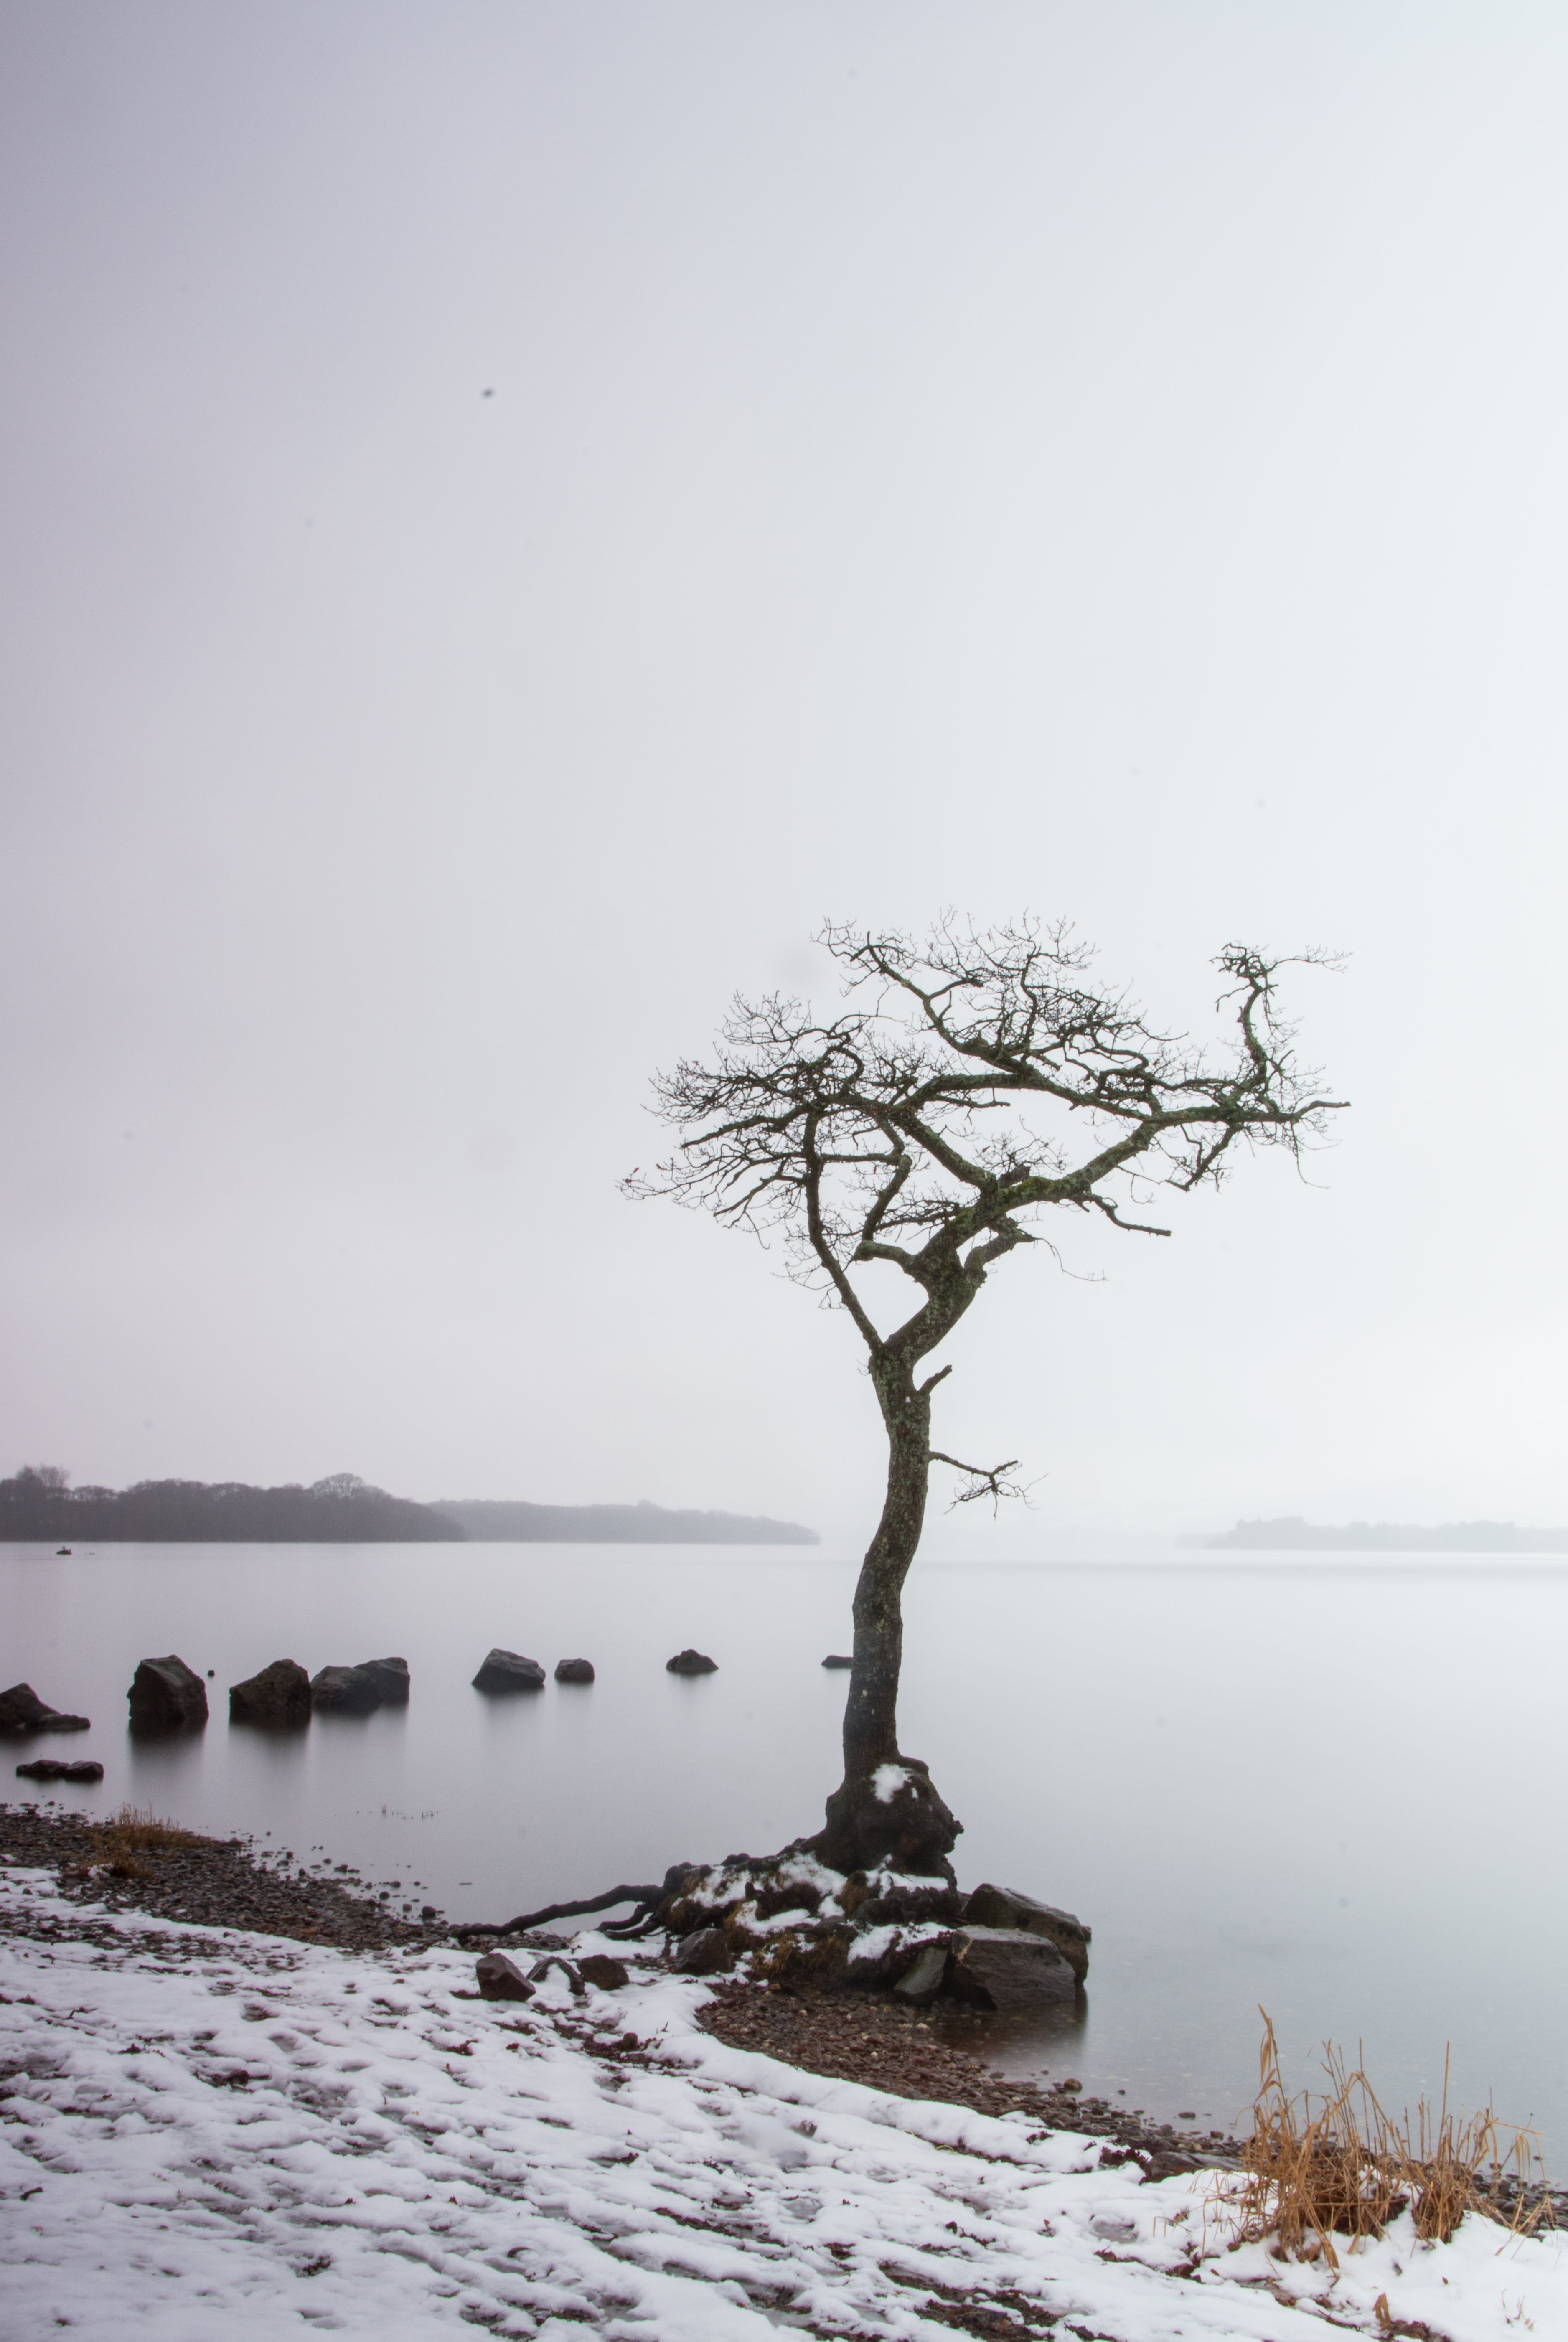 Free stock photo of loch, Loch Lomond, rocks, snow